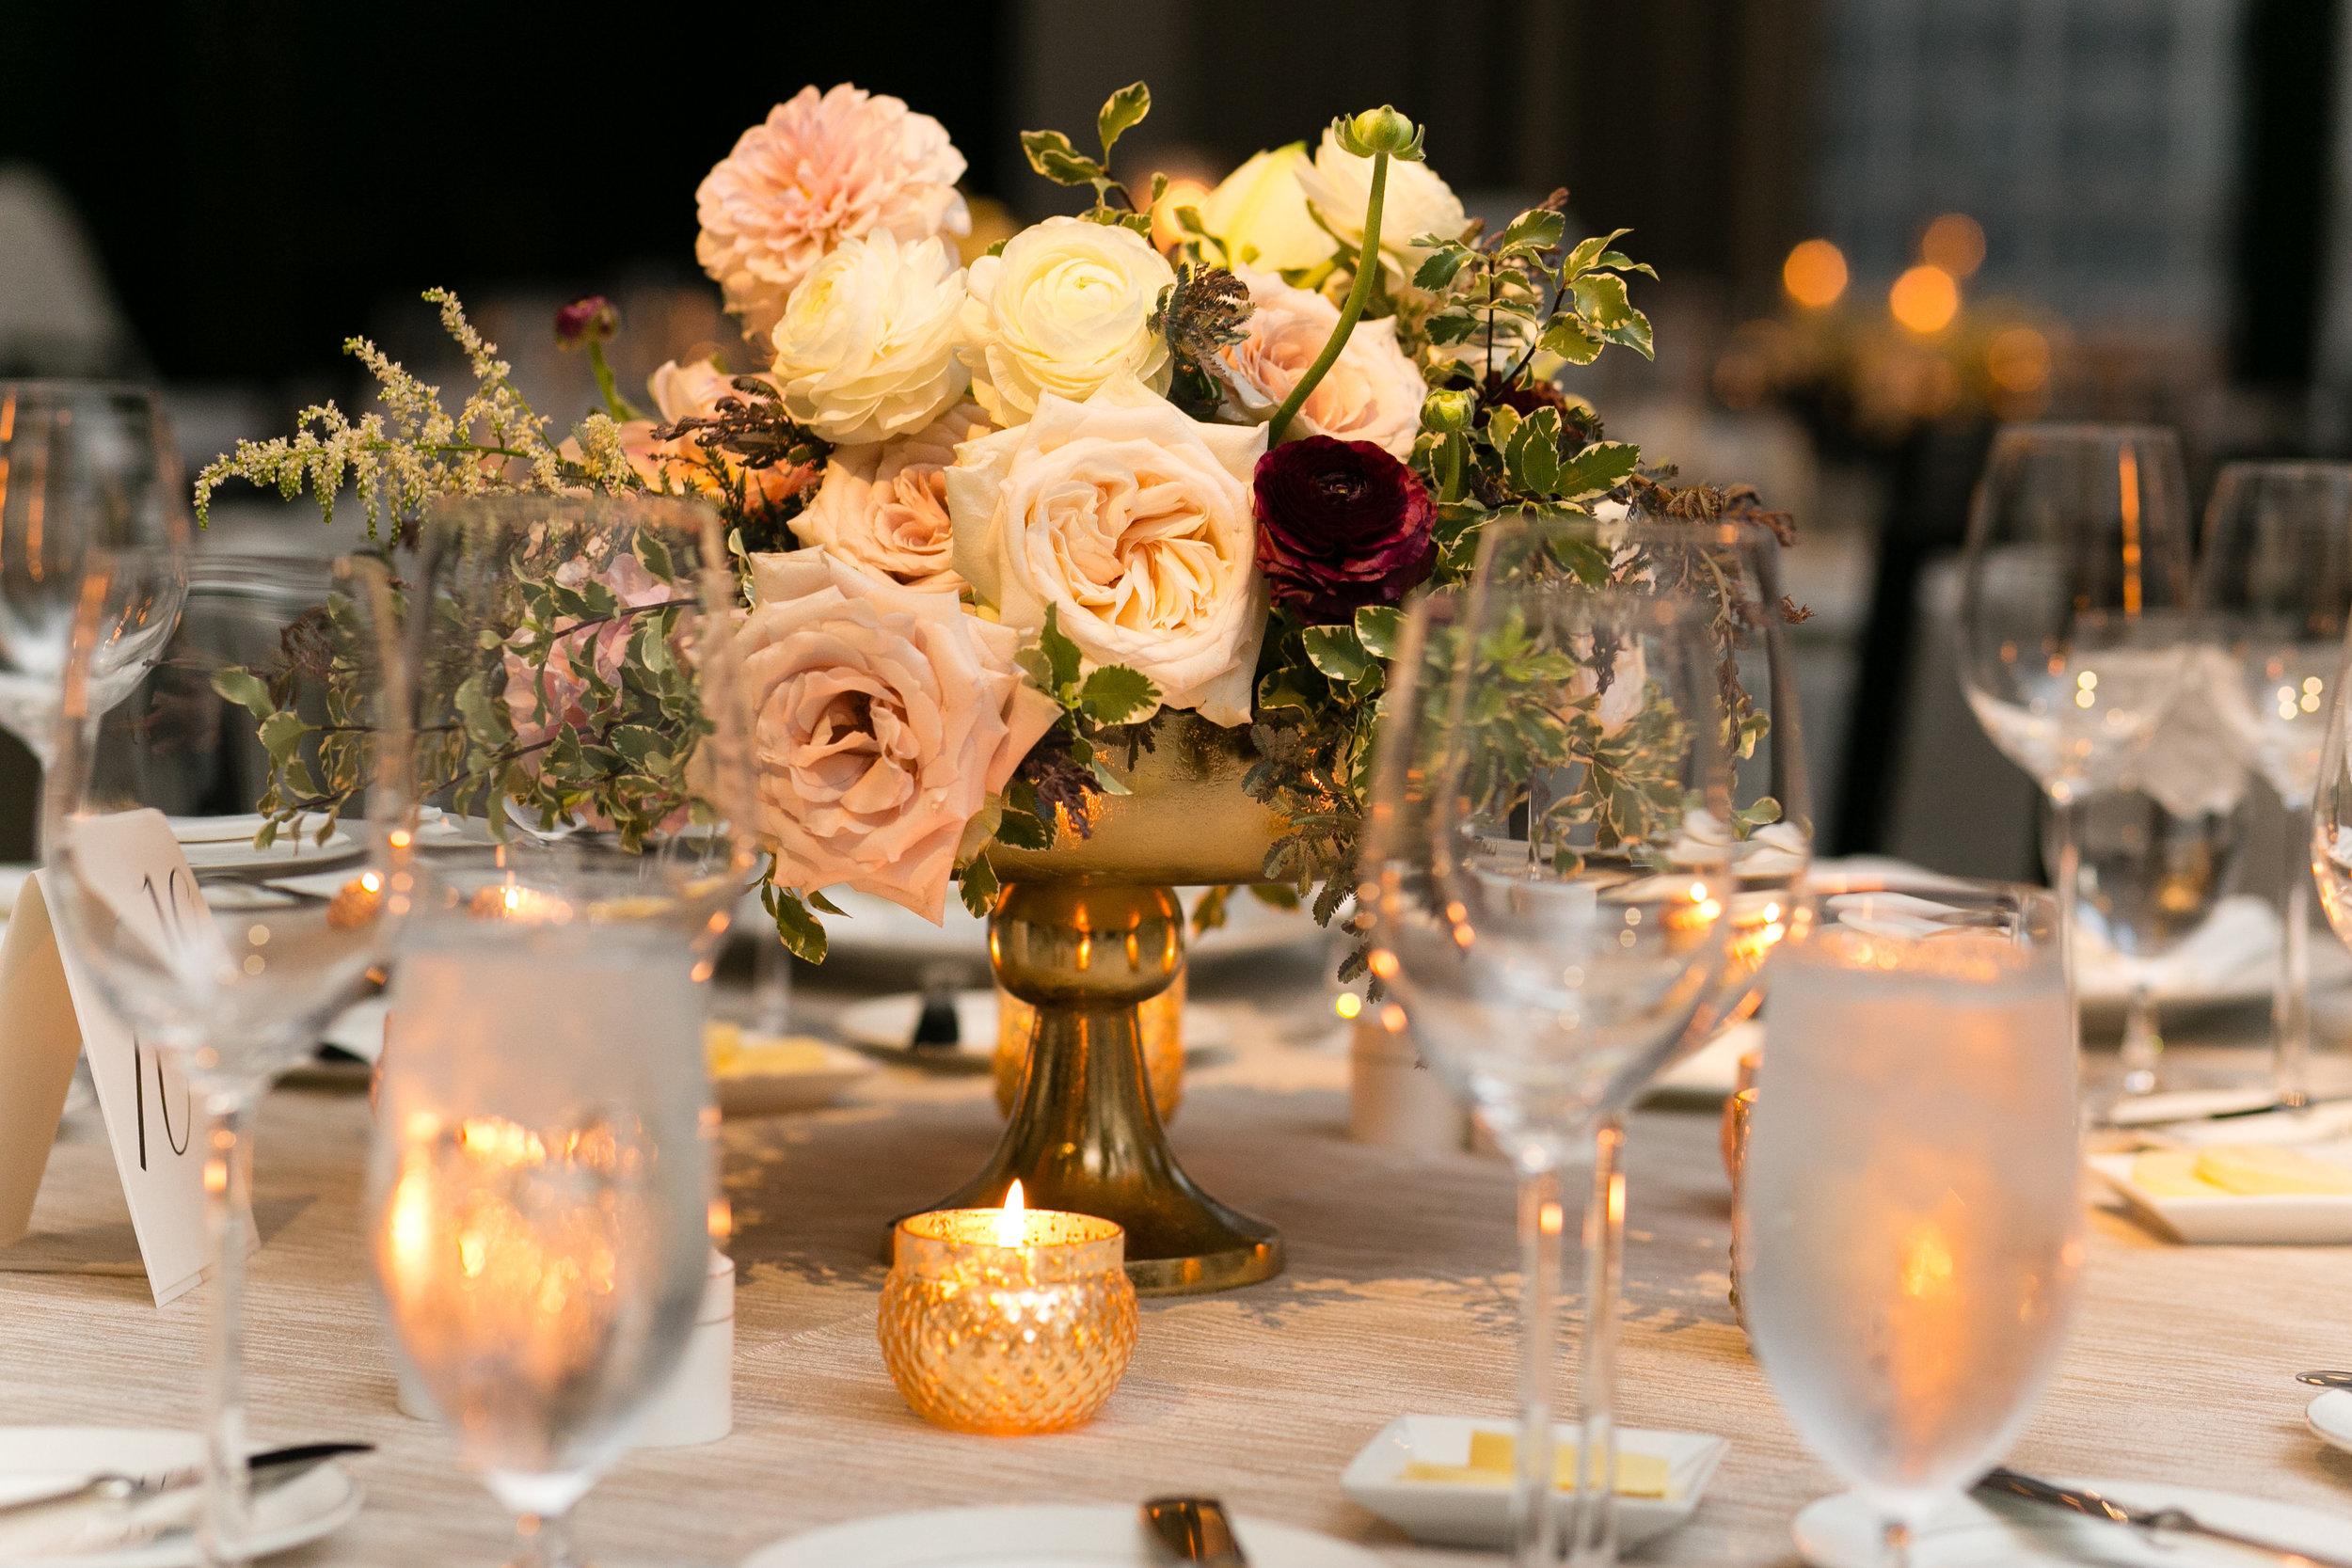 Fleur-Inc-Emilia-Jane-Photography-Estera-Events-Langham-Hotel-Chicago-Wedding-Lush-Centerpiece